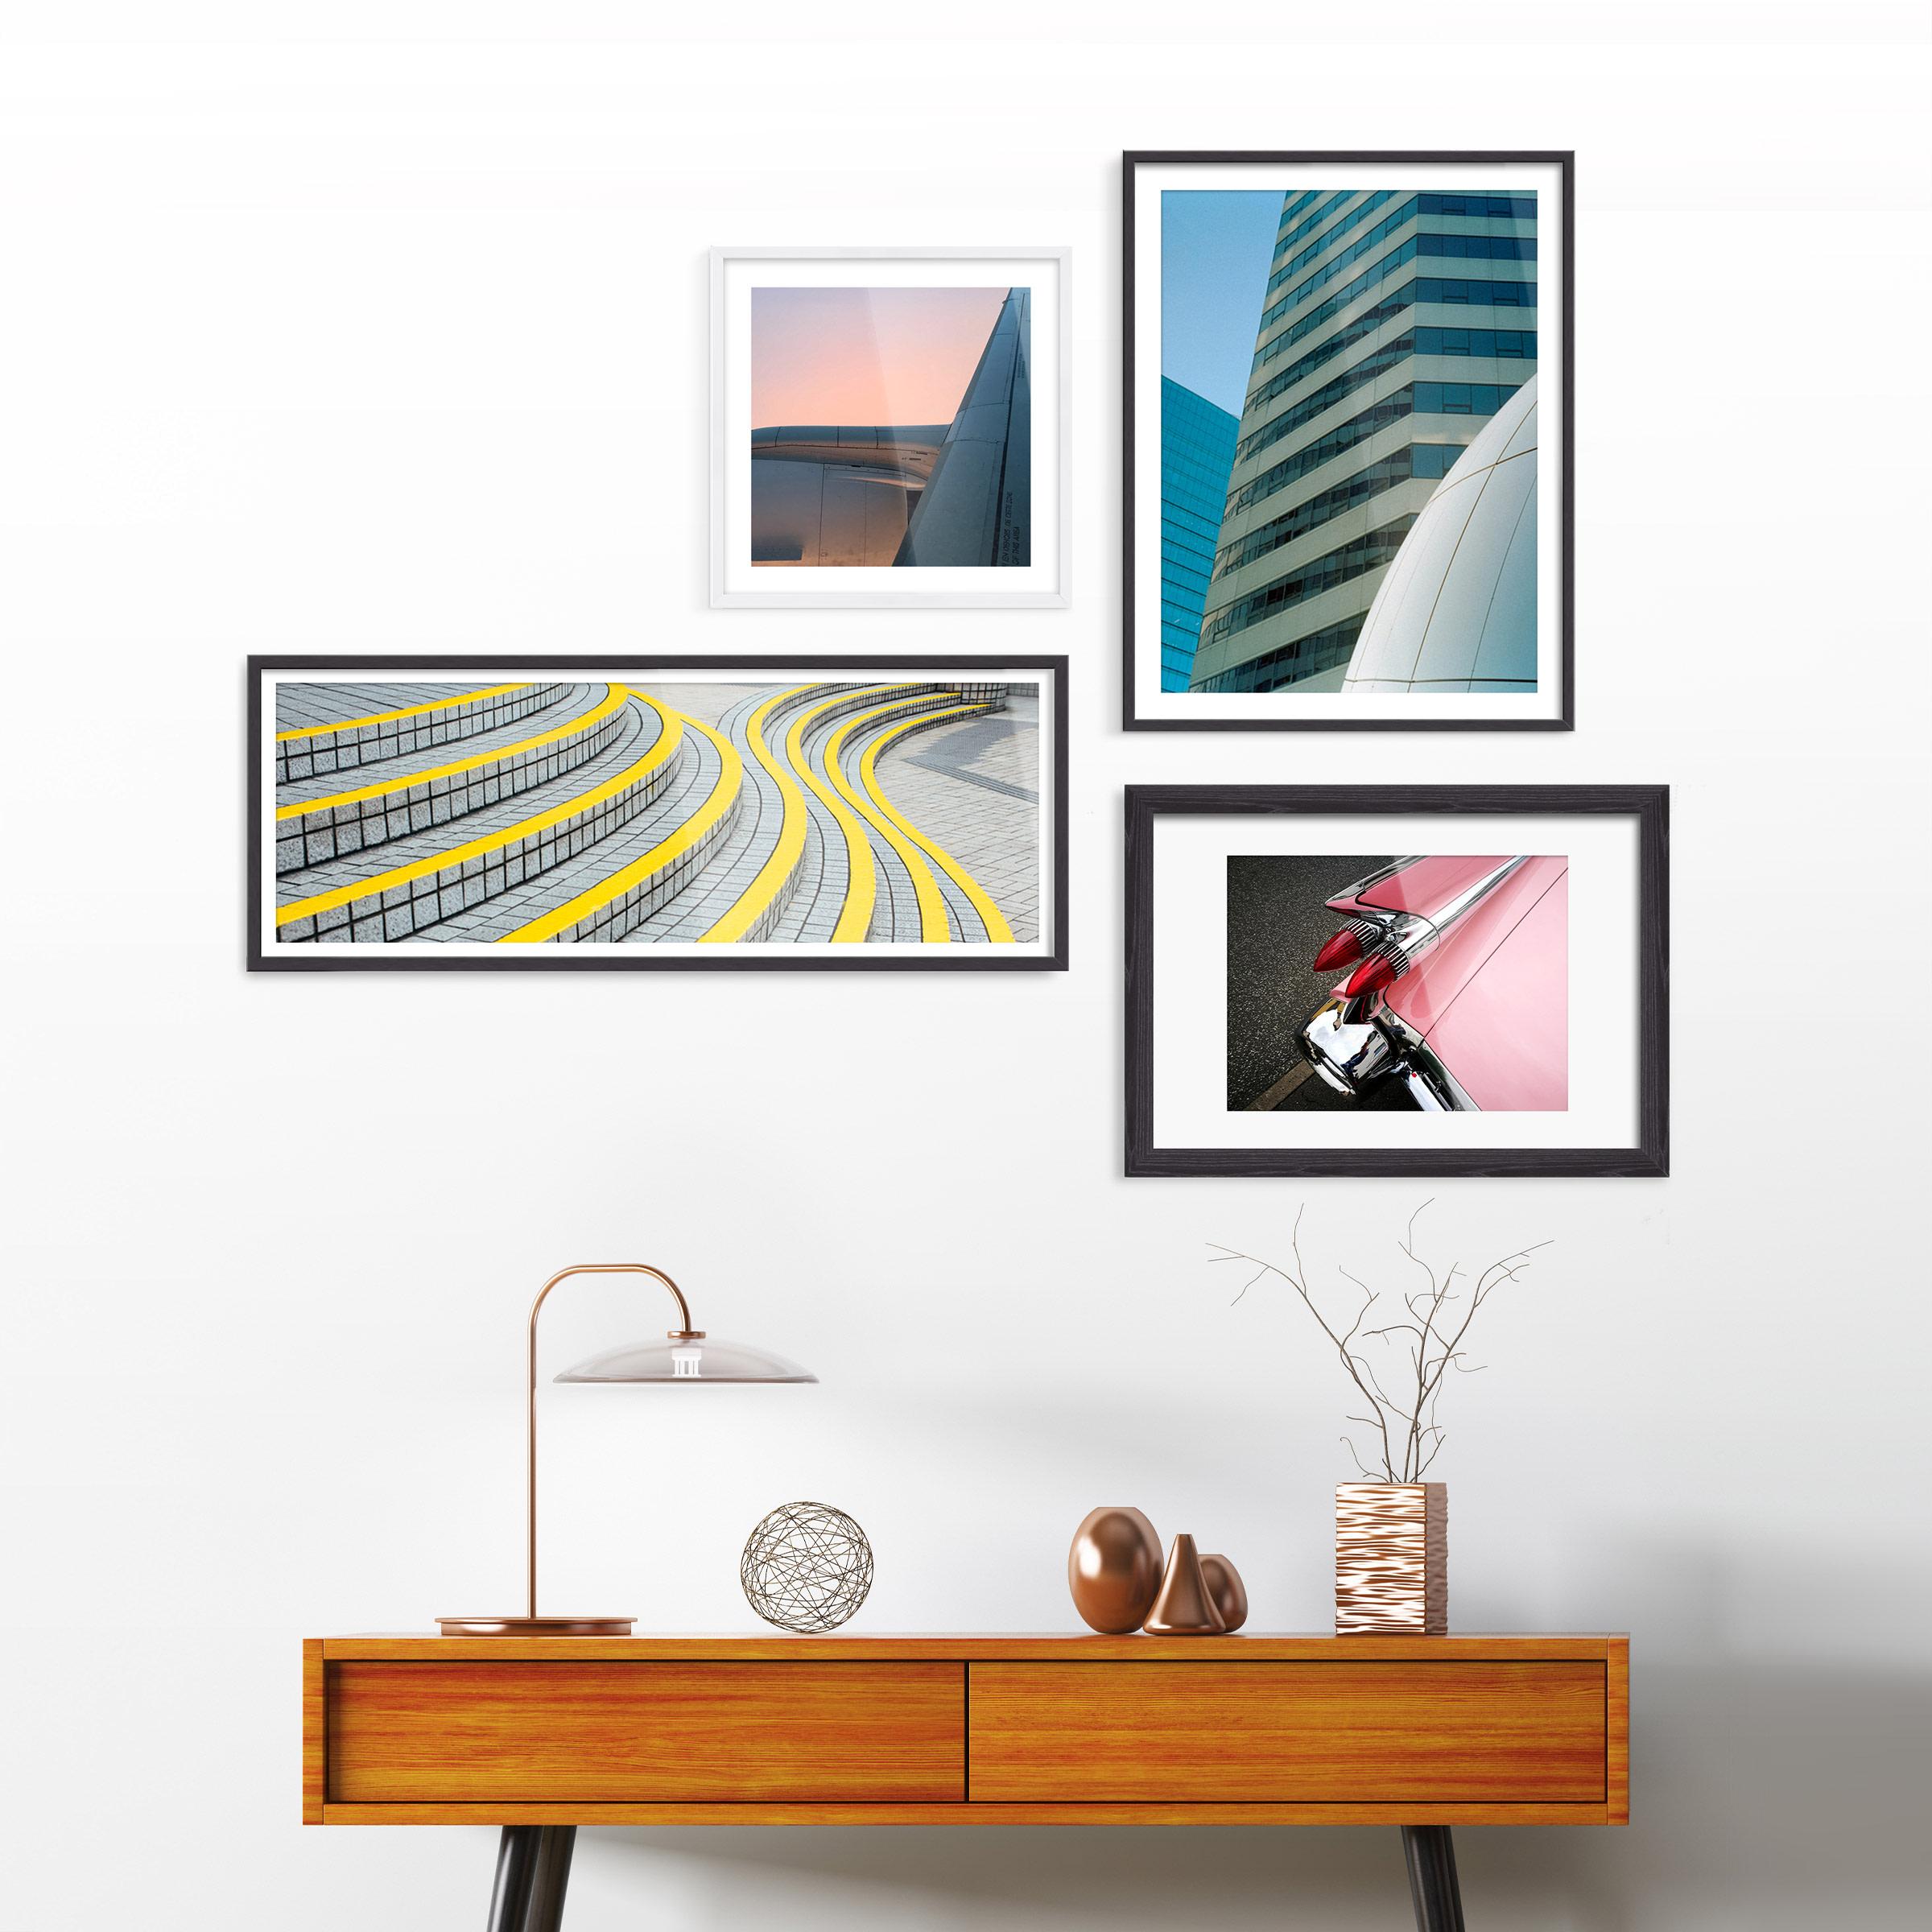 print-on-fuji-flex-high-gloss-automobil-inspiration-1200x1200.jpg